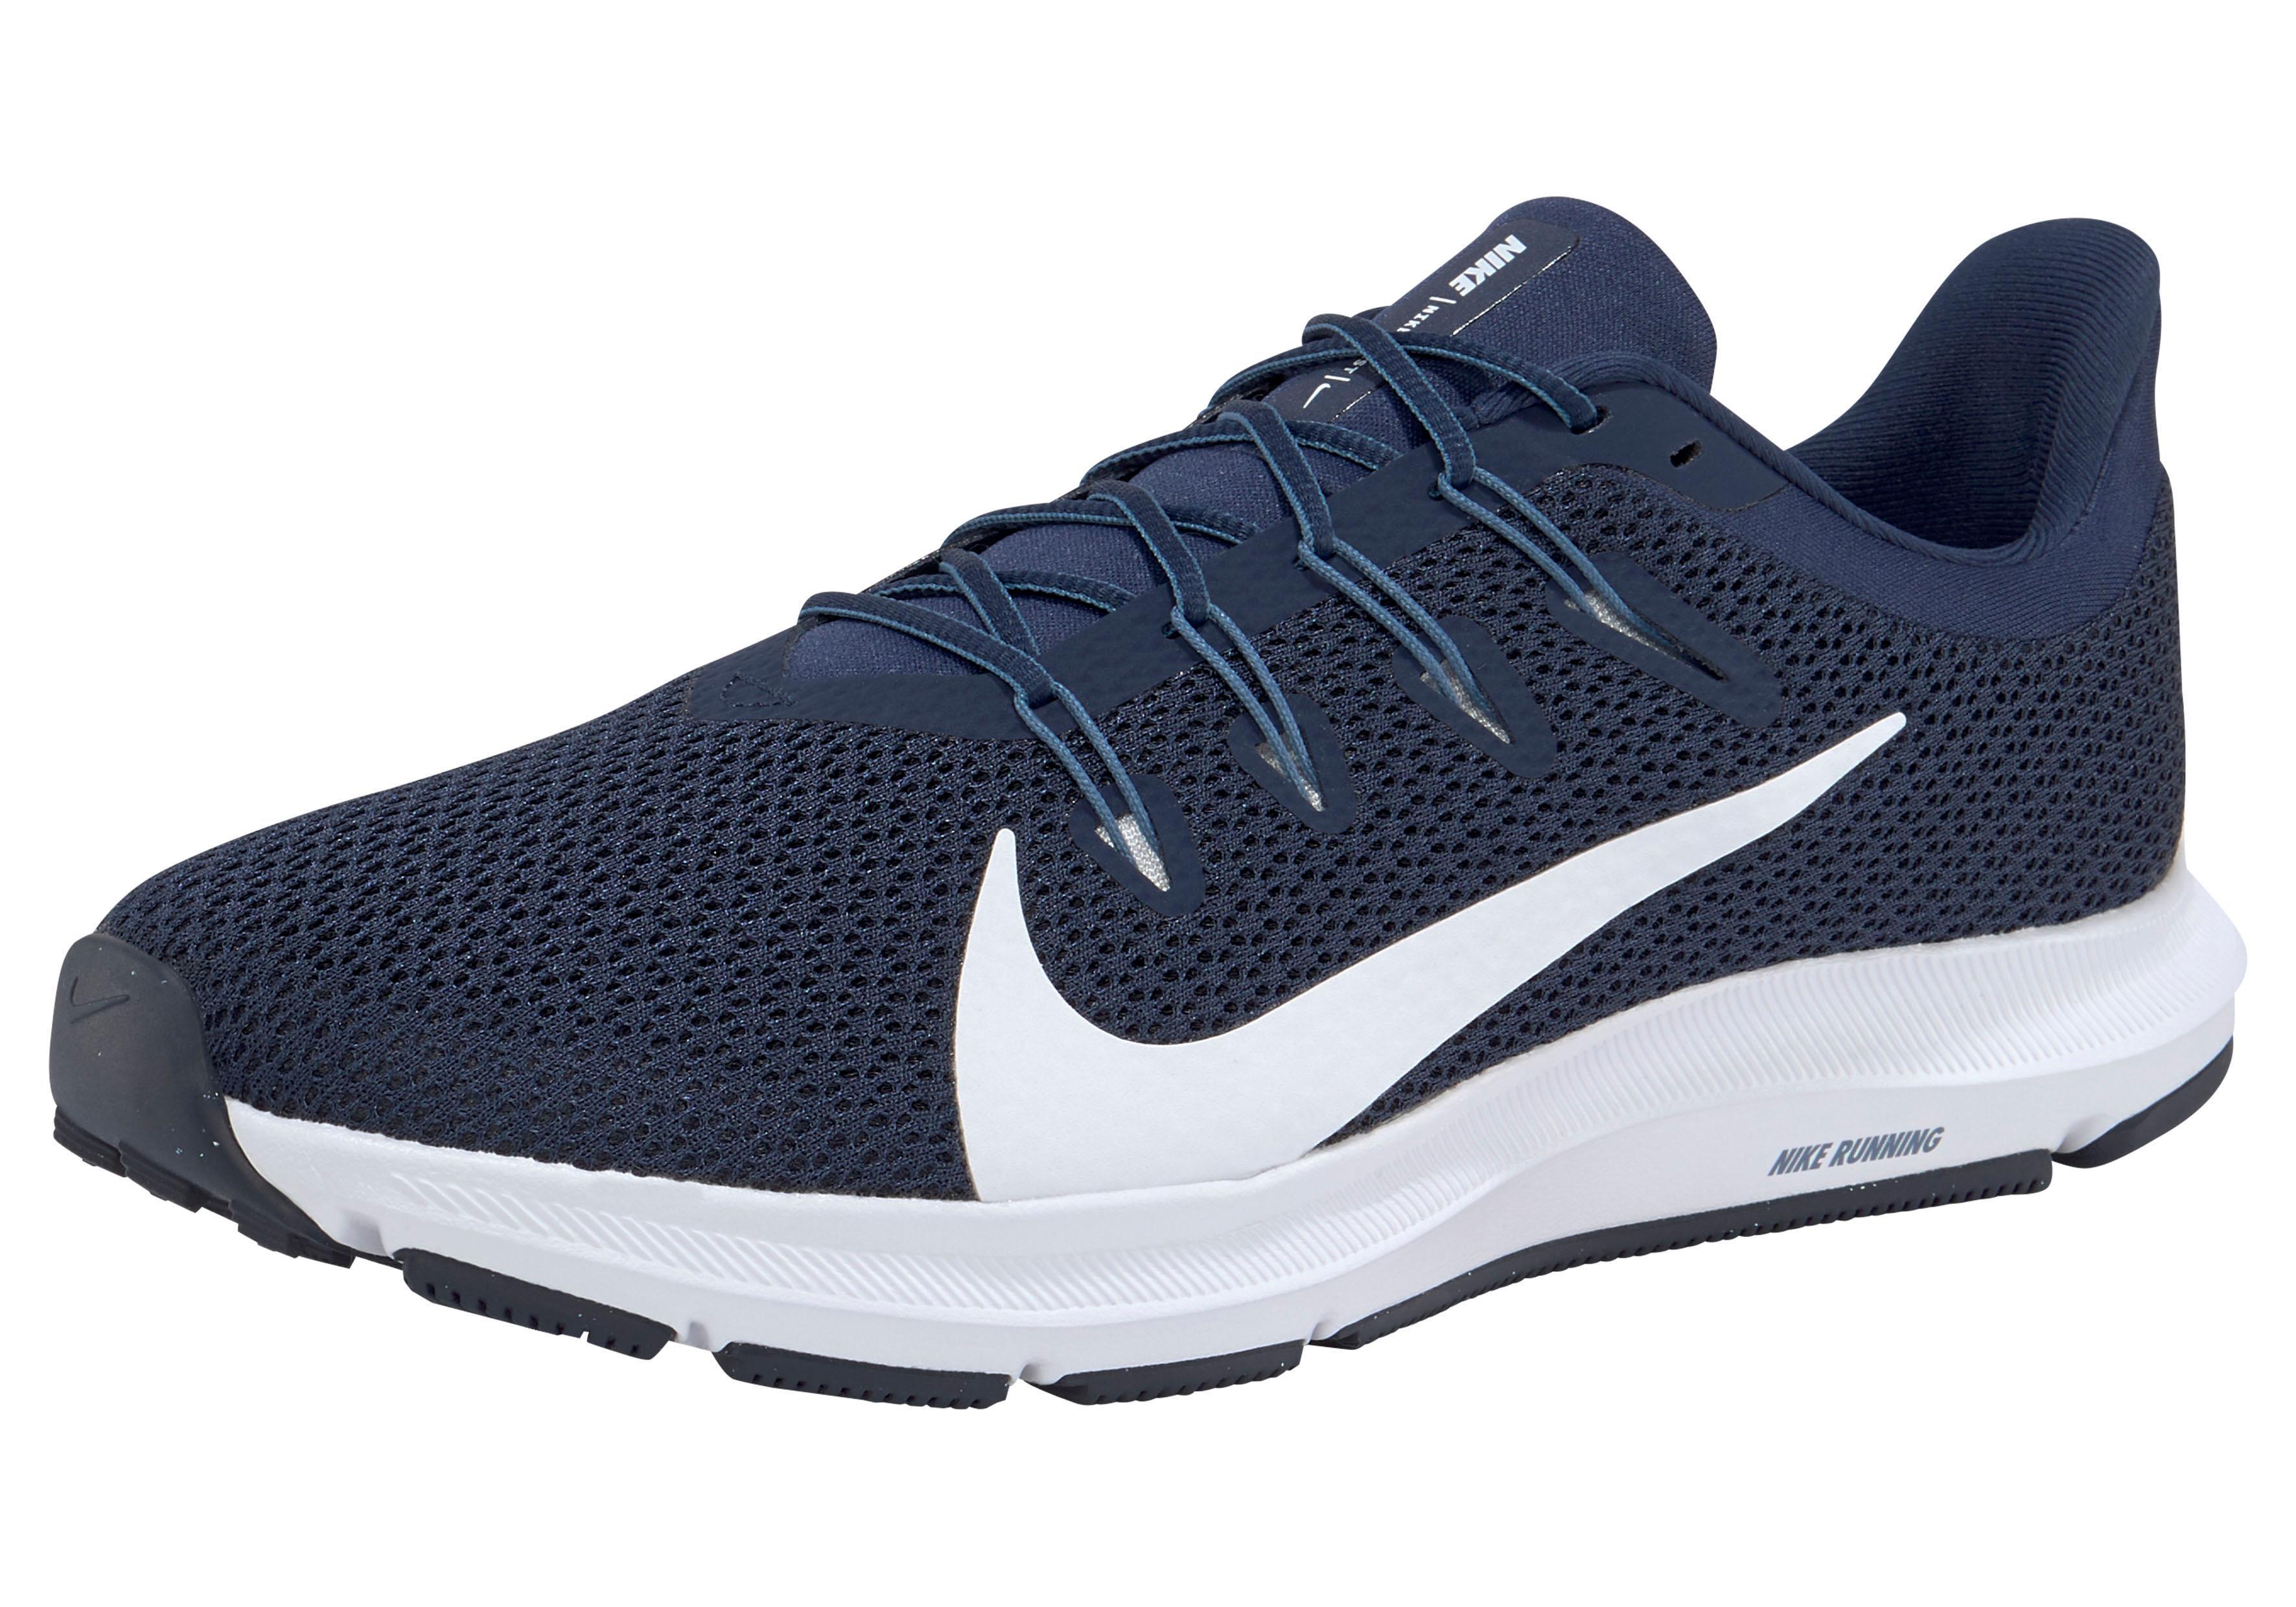 Nike Laufschuh Quest 2 | Schuhe > Sportschuhe > Laufschuhe | Blau | Nike